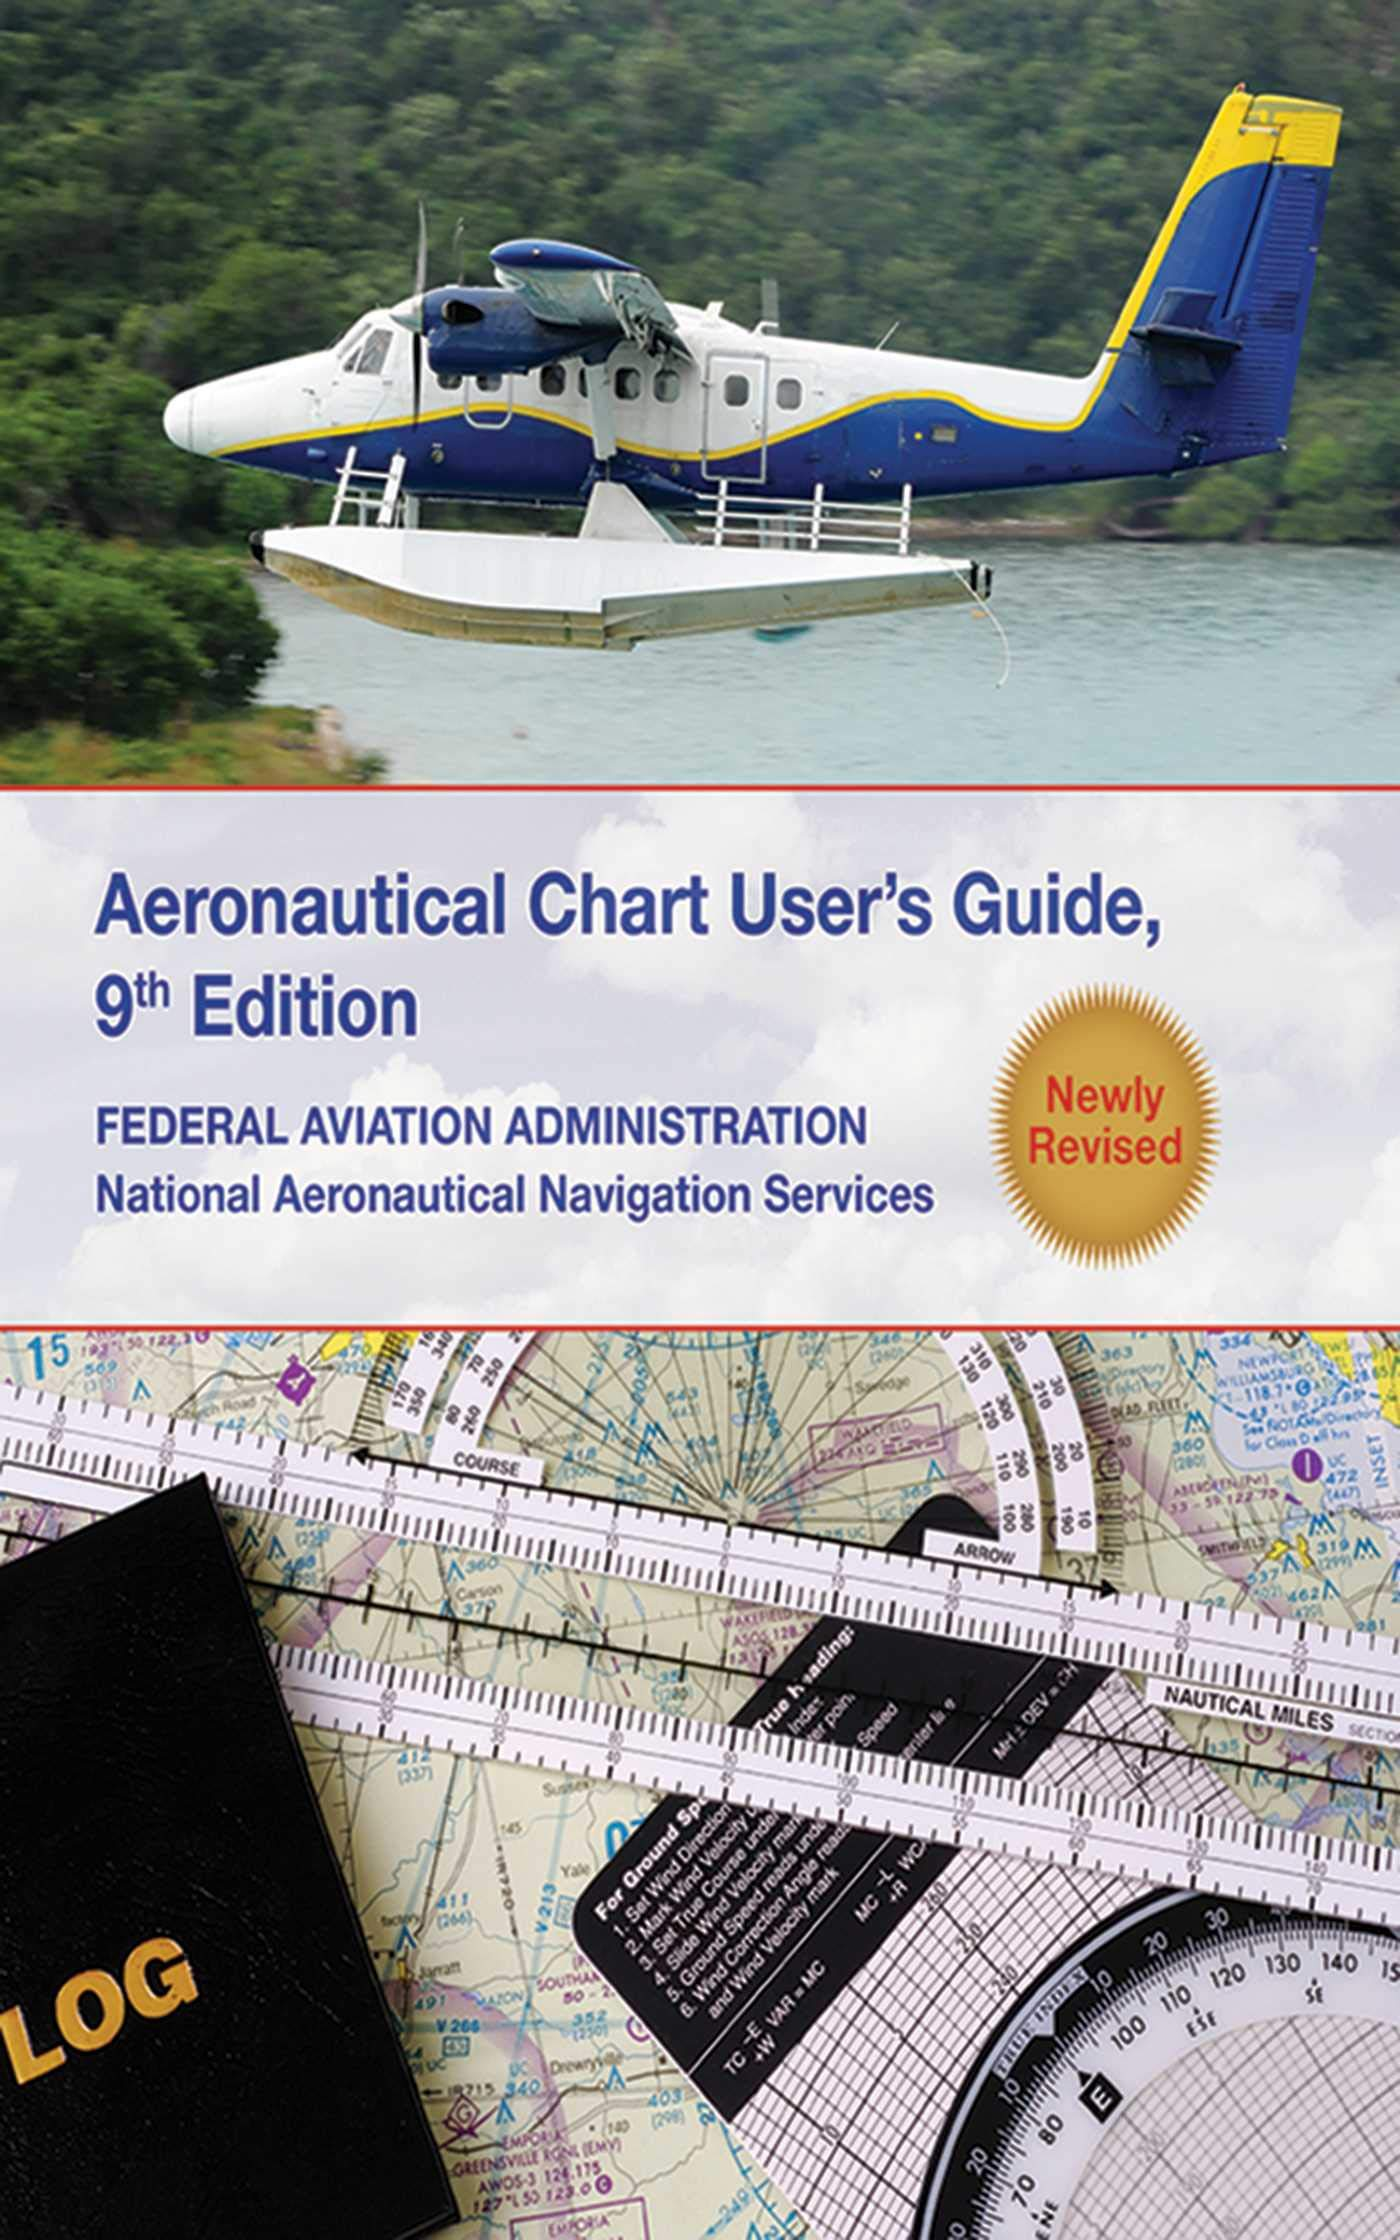 Aeronautical Chart Users Guide: National